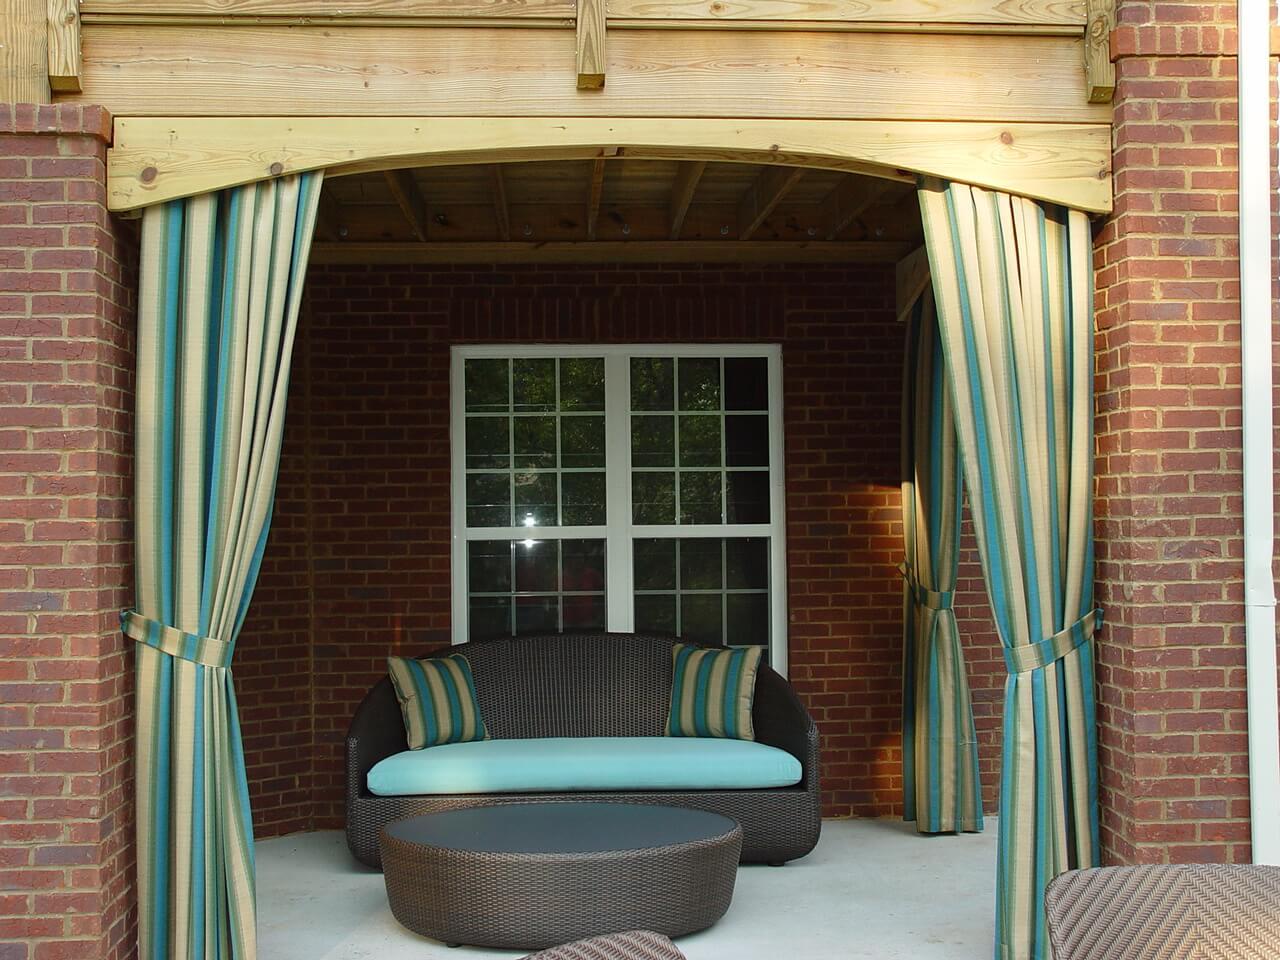 custom-furniture-upholstery-design-atlanta-georgia-18.JPG